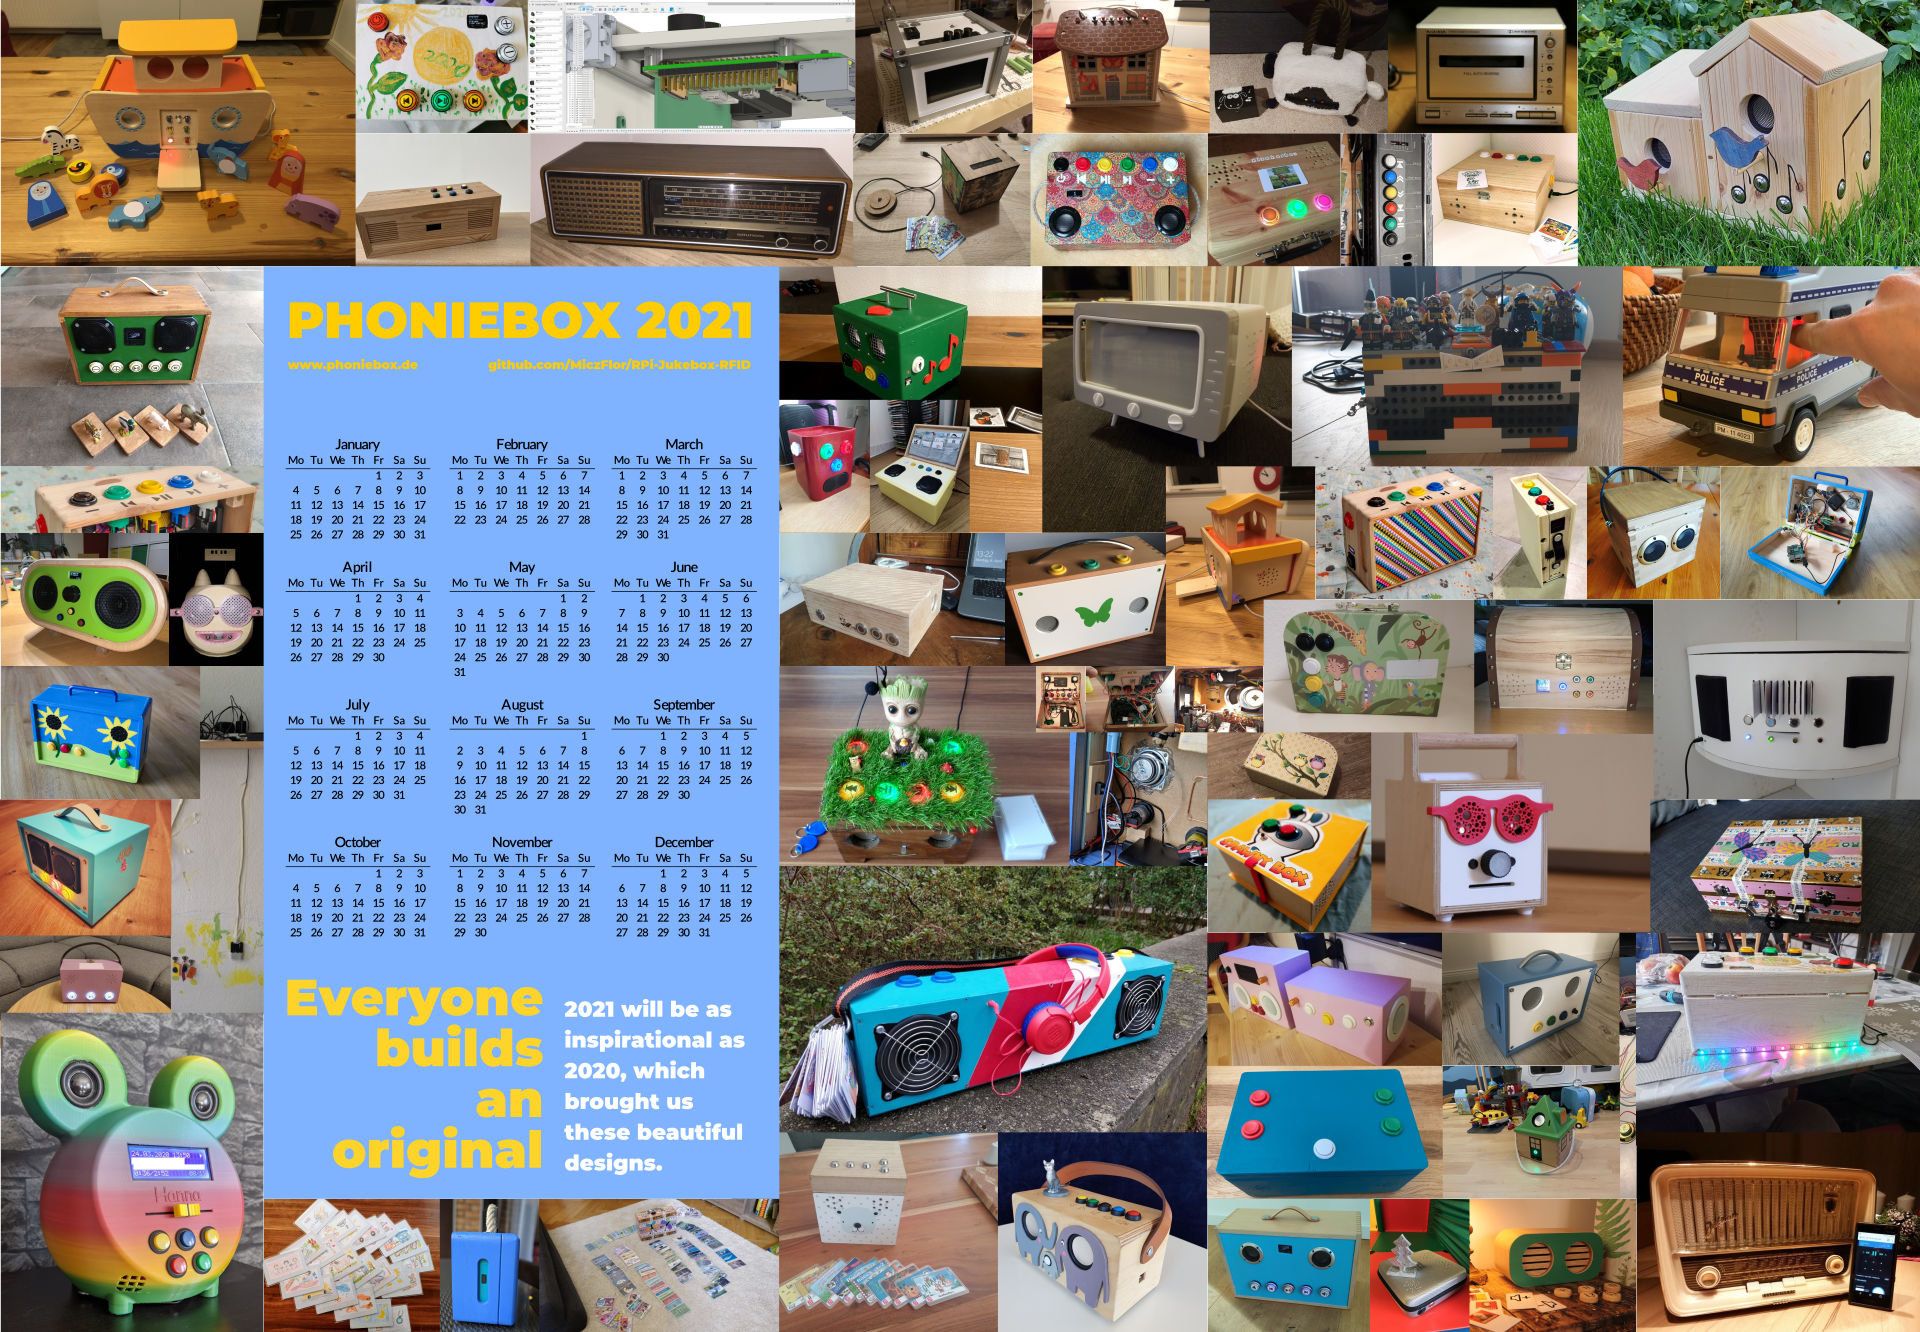 The 2021 Phoniebox Calendar